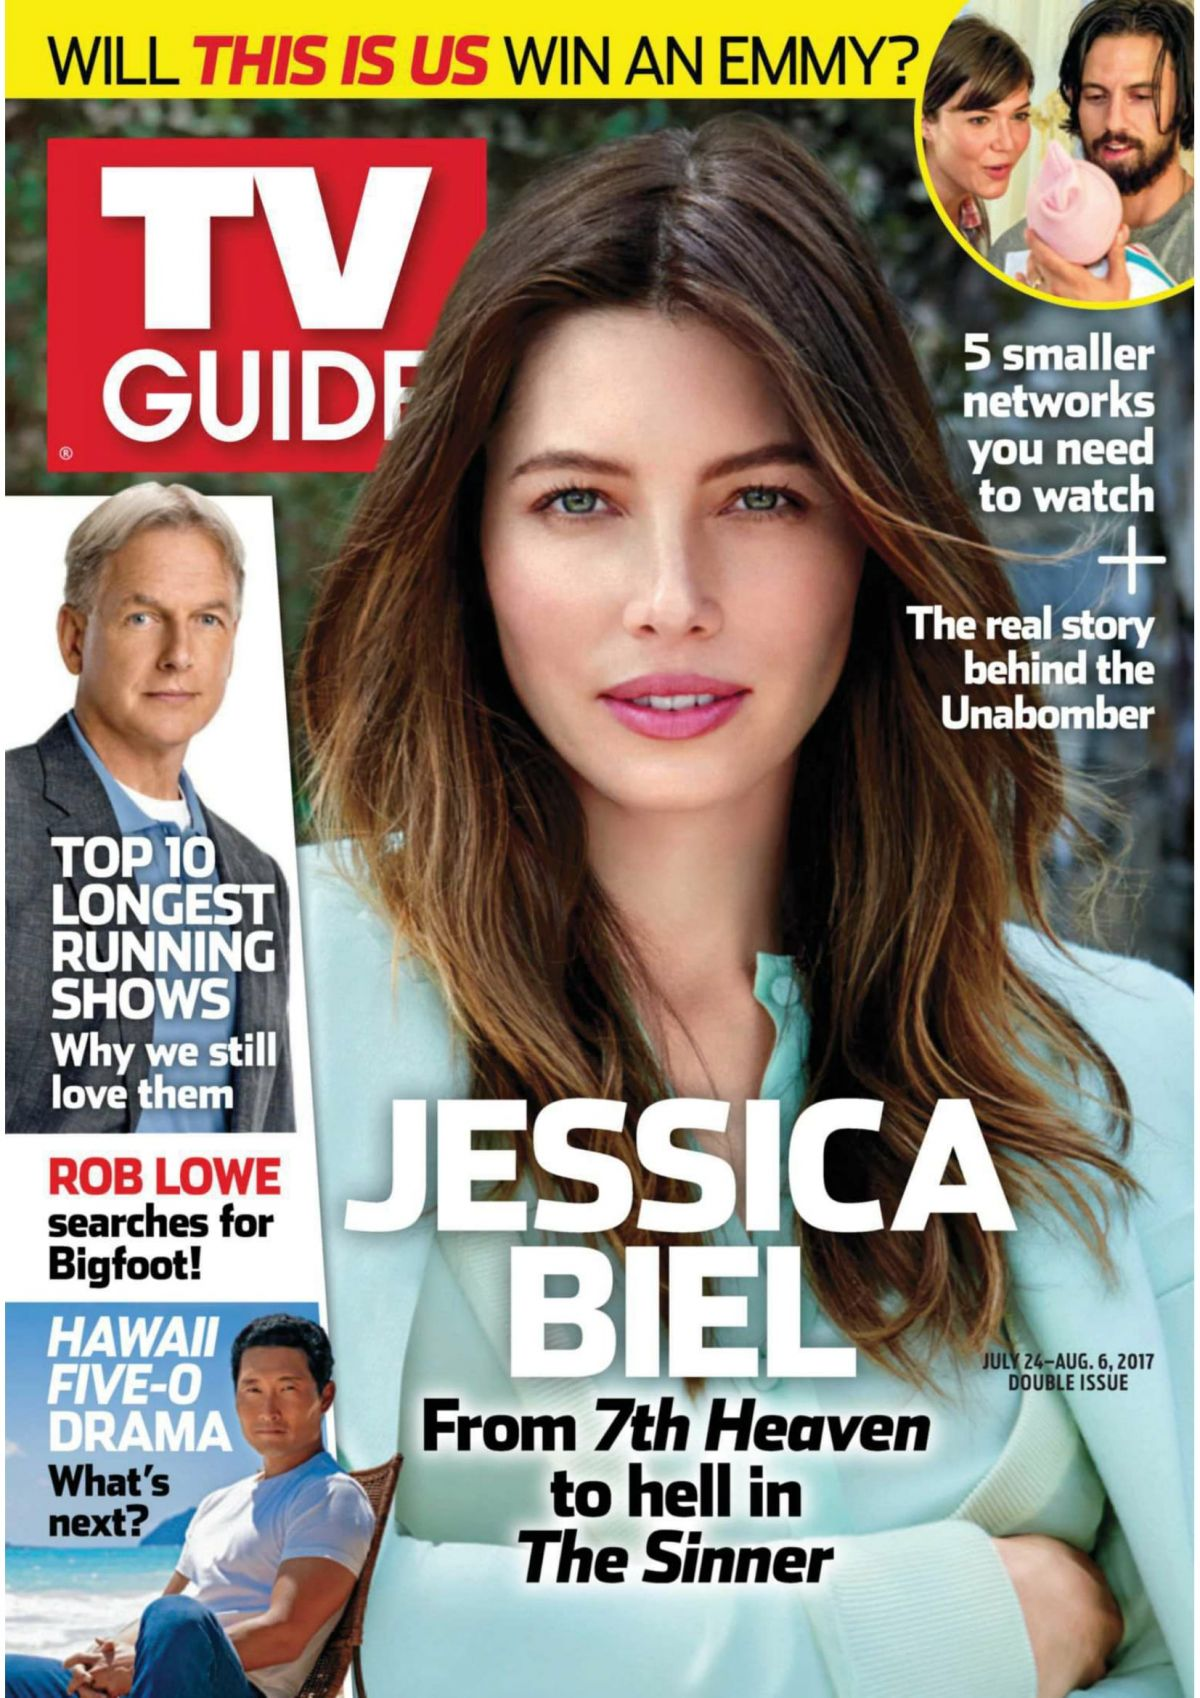 JESSICA BIEL in TV Guide Magazine, July 2017